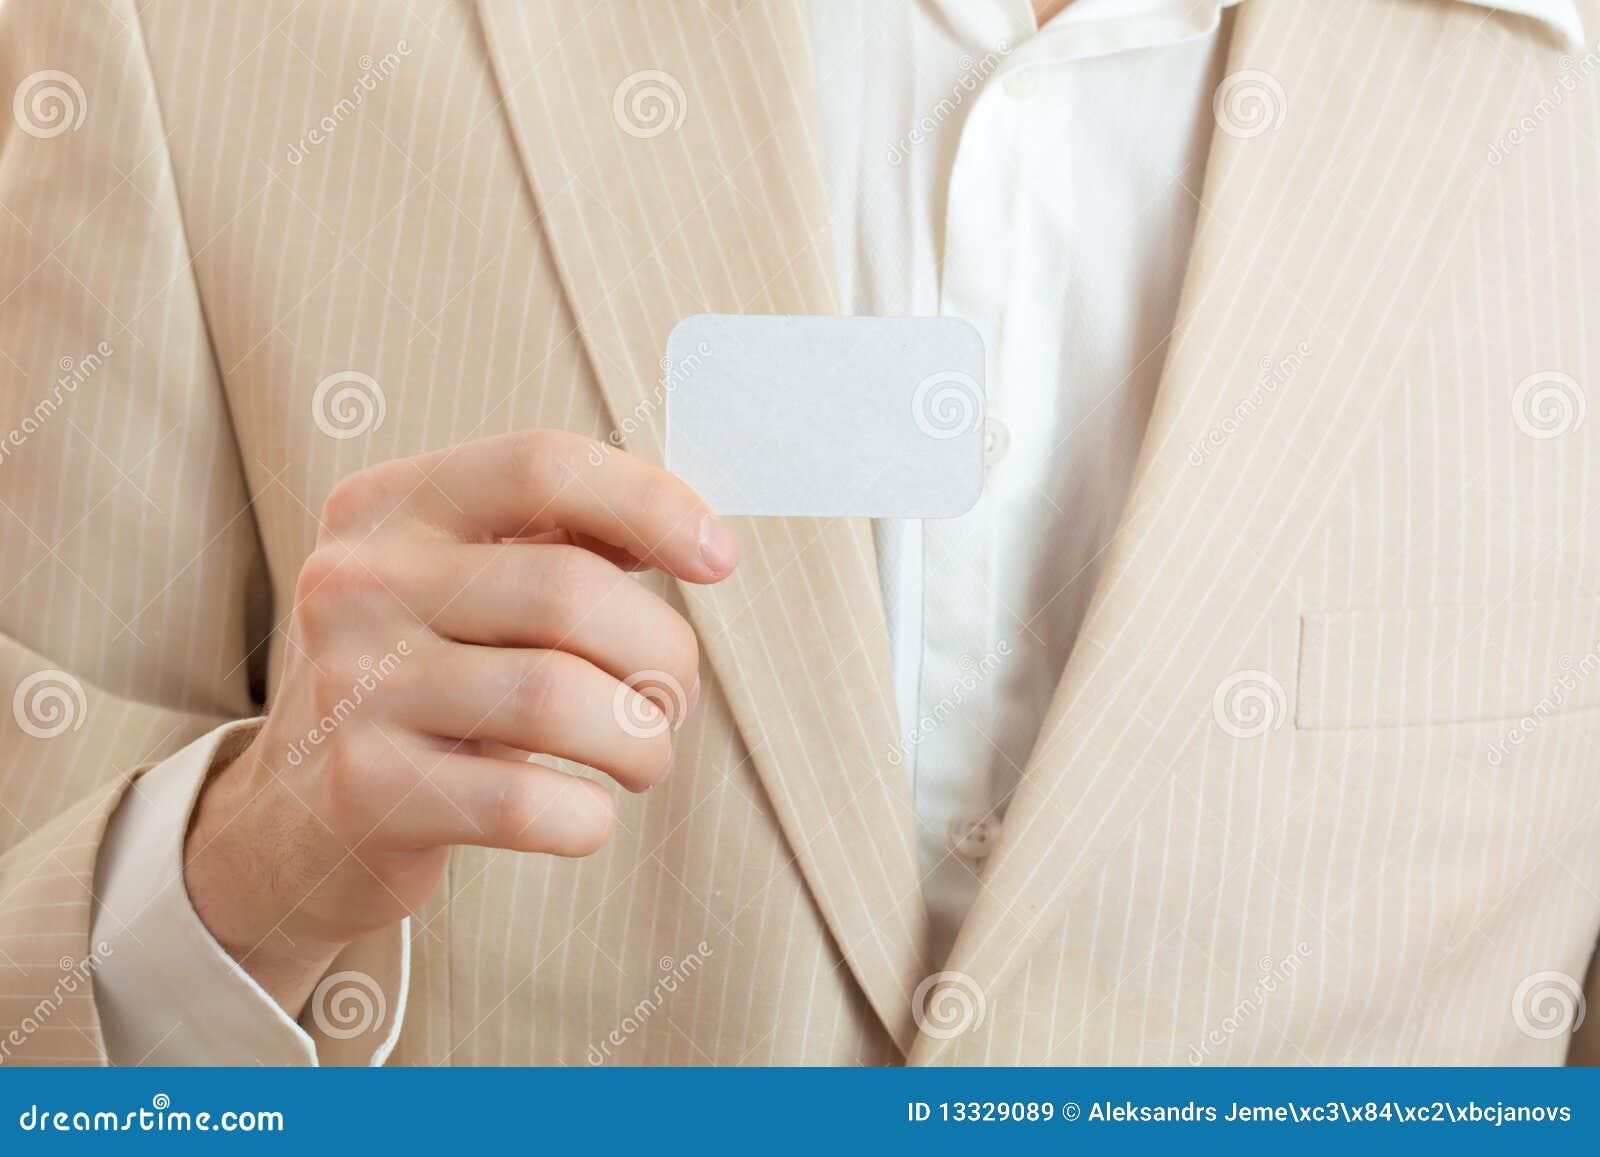 Pustej karty mienia mężczyzna